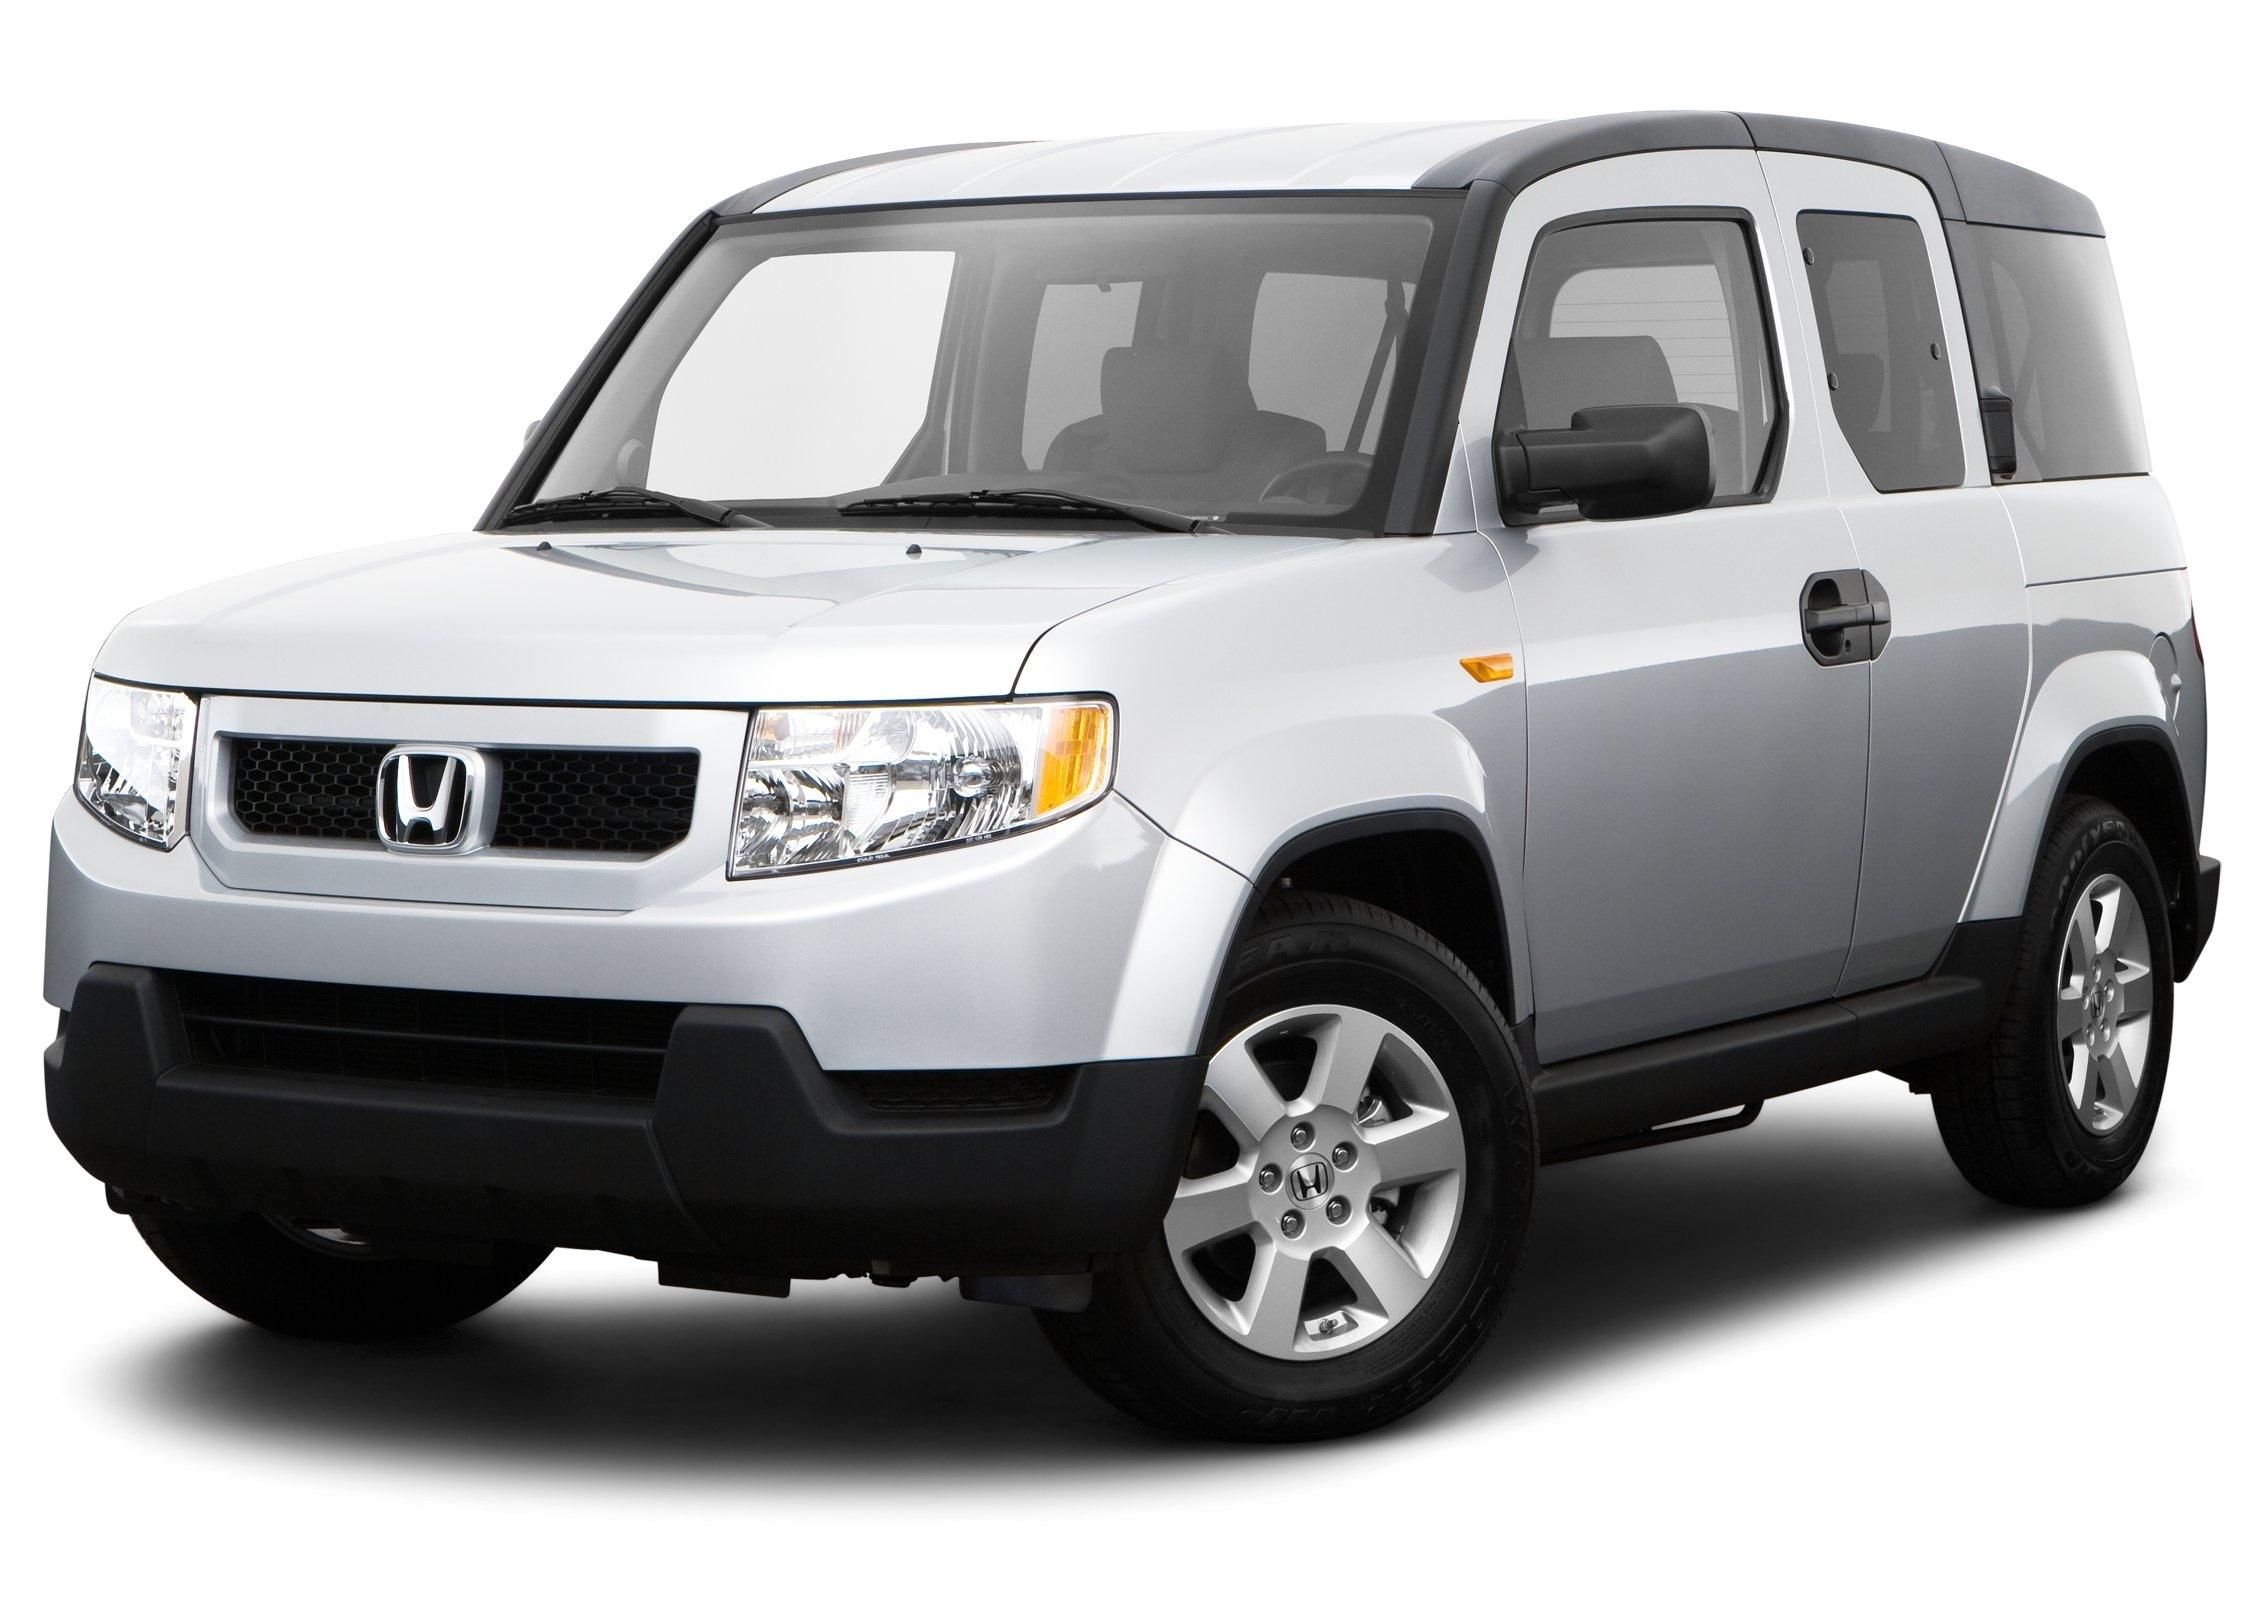 2009 honda element ex 2 wheel drive 5 door automatic transmission